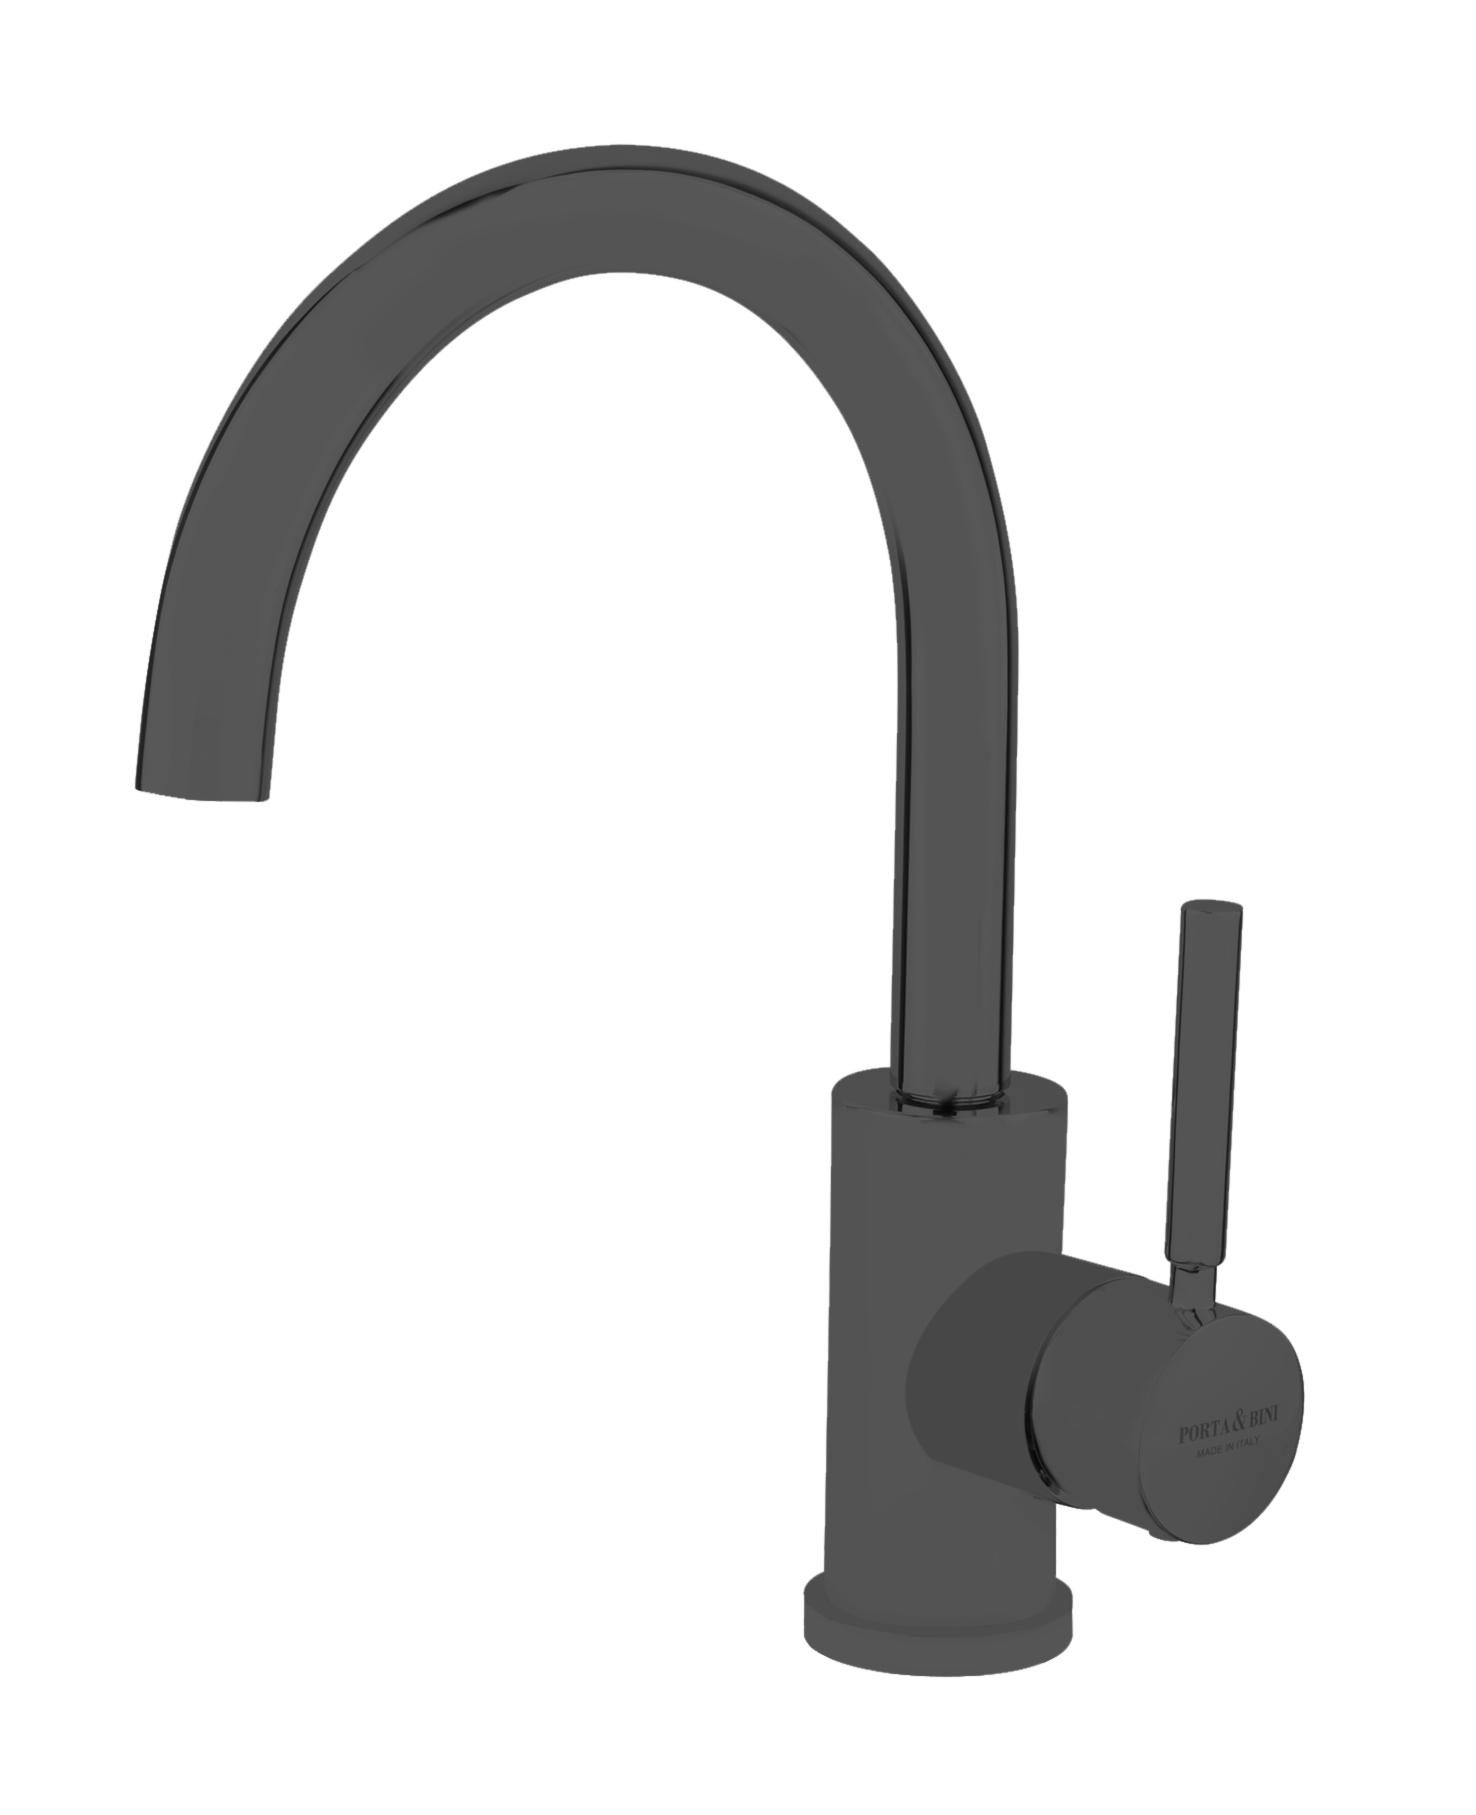 Single lever basin mixer high spout with click-clack outlet, mat black